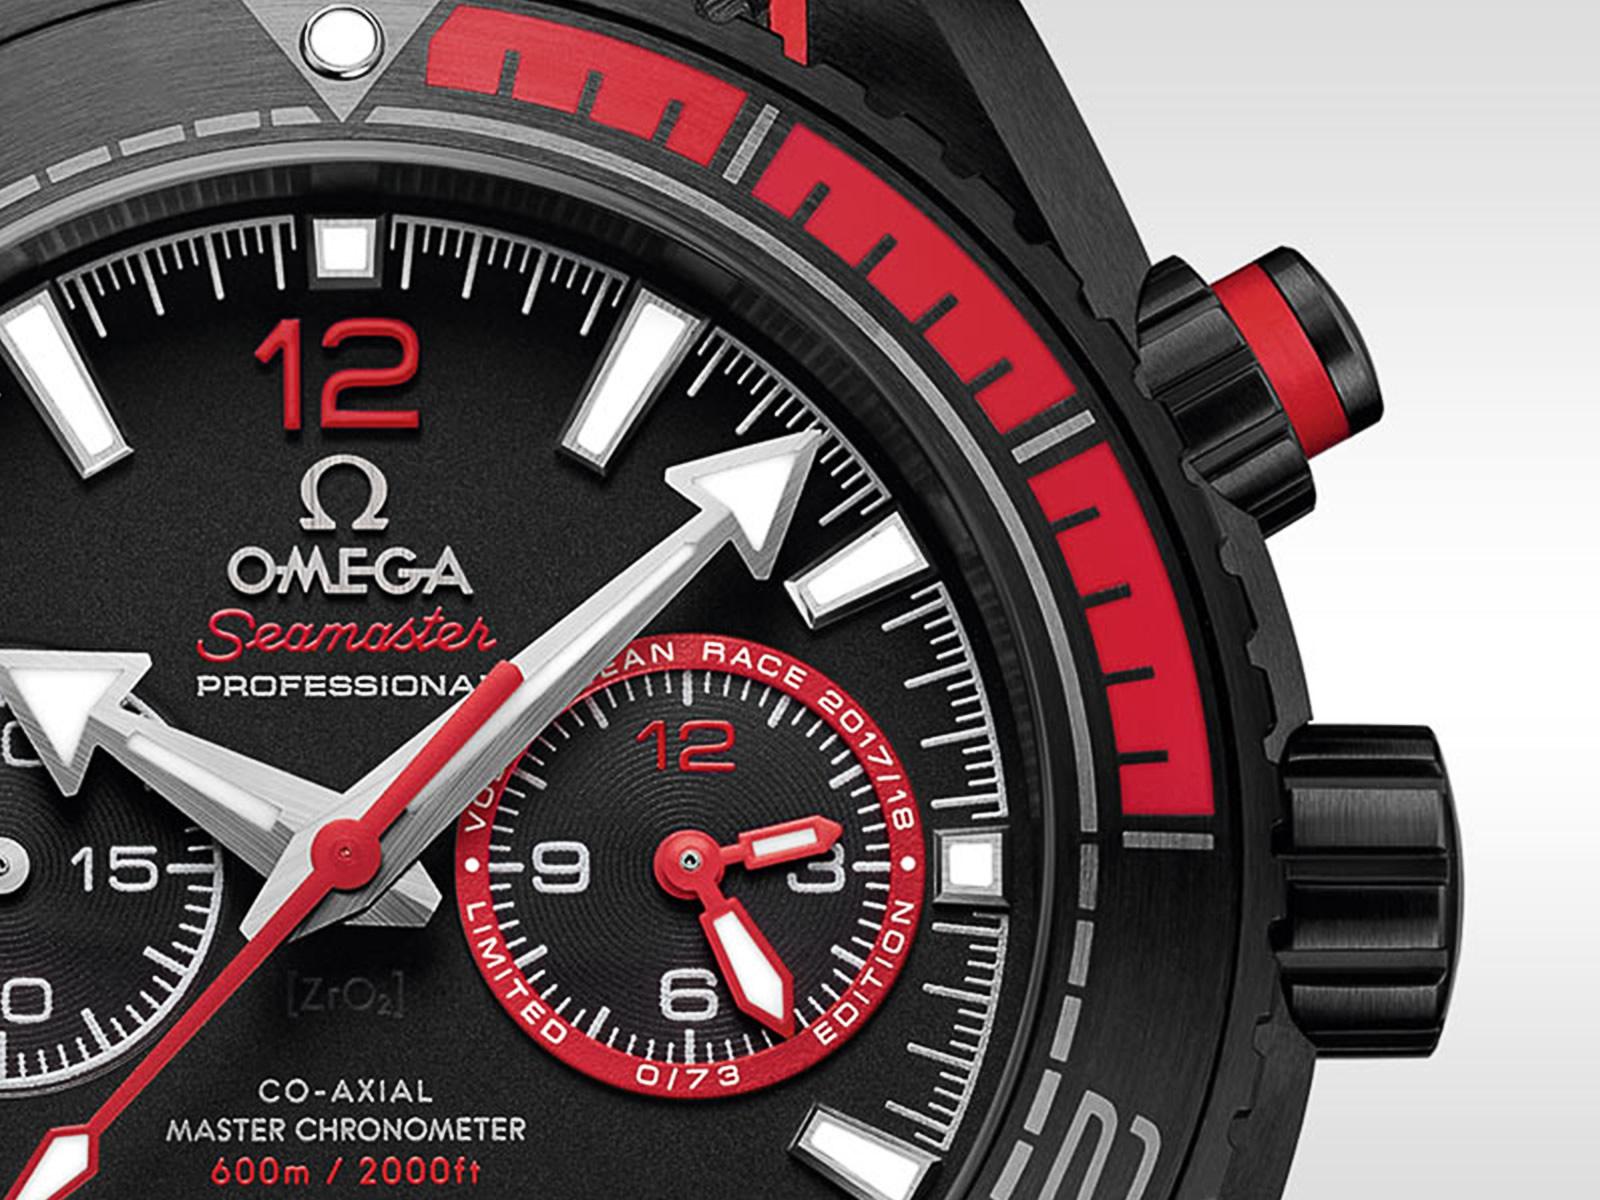 215-92-46-51-01-002-omega-seamaster-planet-ocean-volvo-ocean-race-limited-edition-4-.jpg